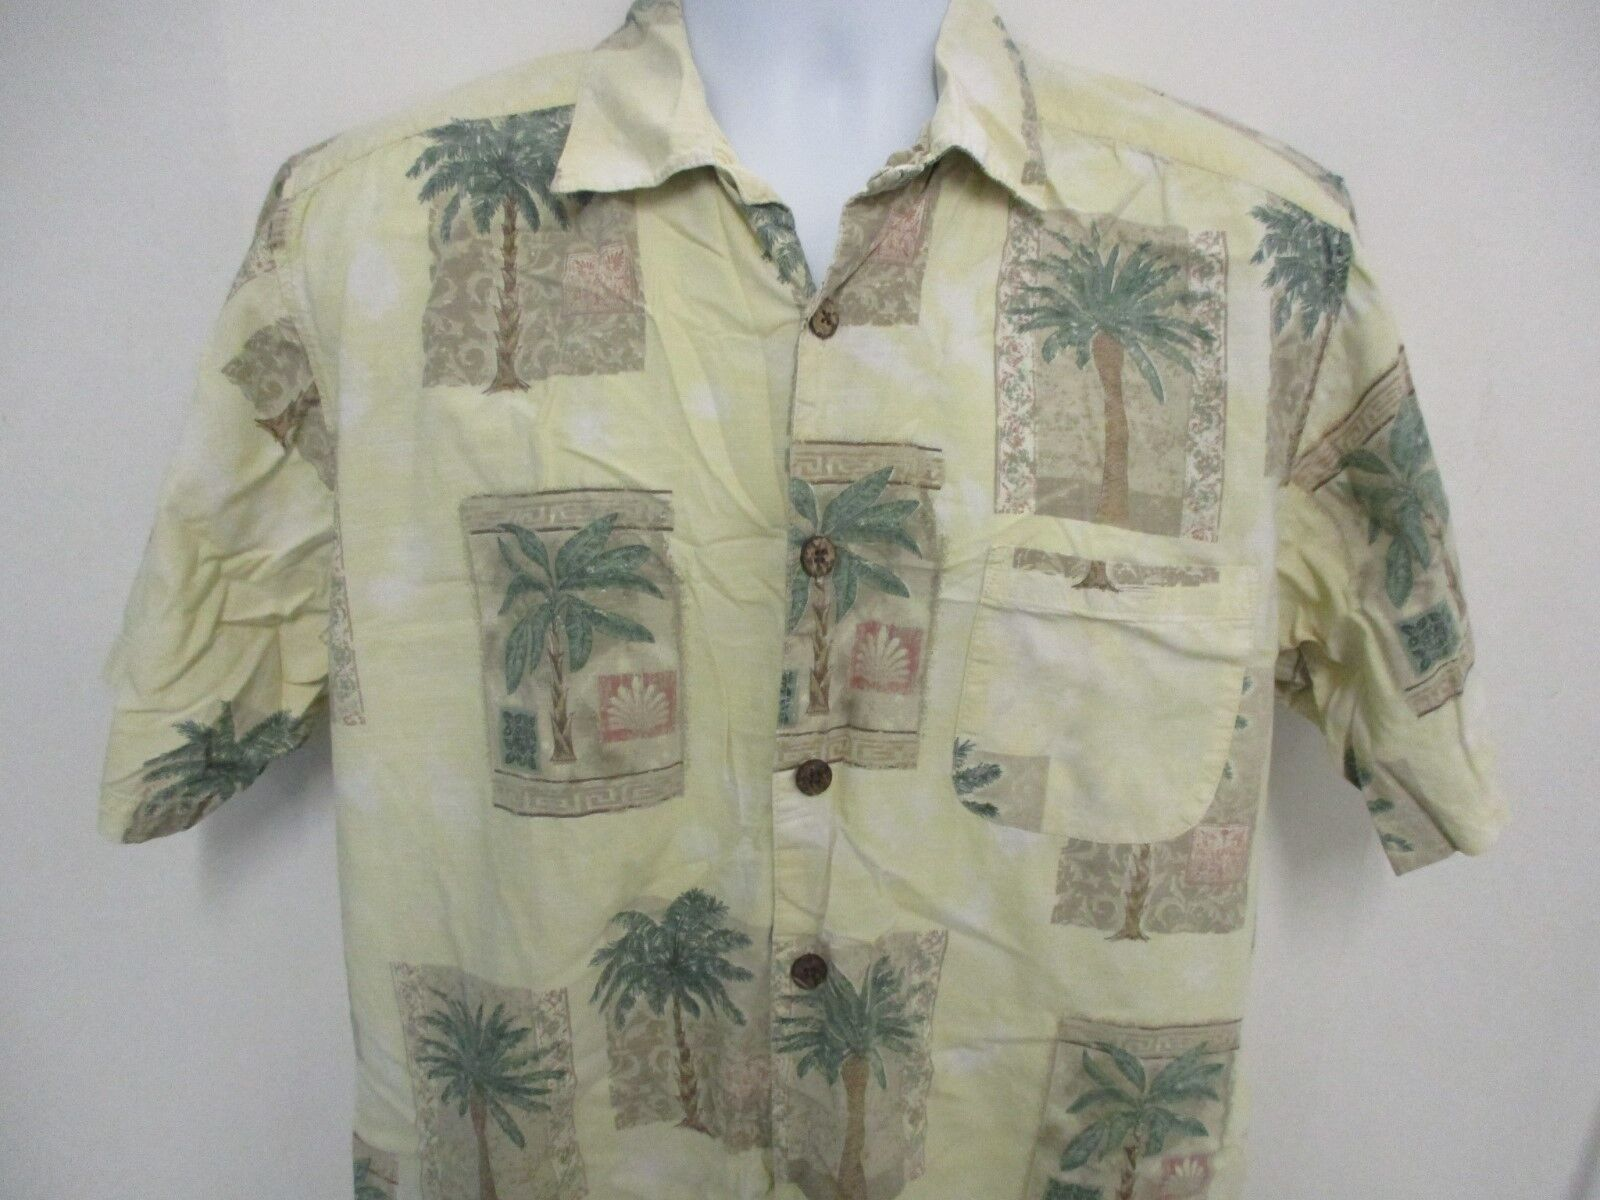 Joe Marlin Hawaiian Camp Style Shirt, S S, Extra Large, Yellow with Palm Trees